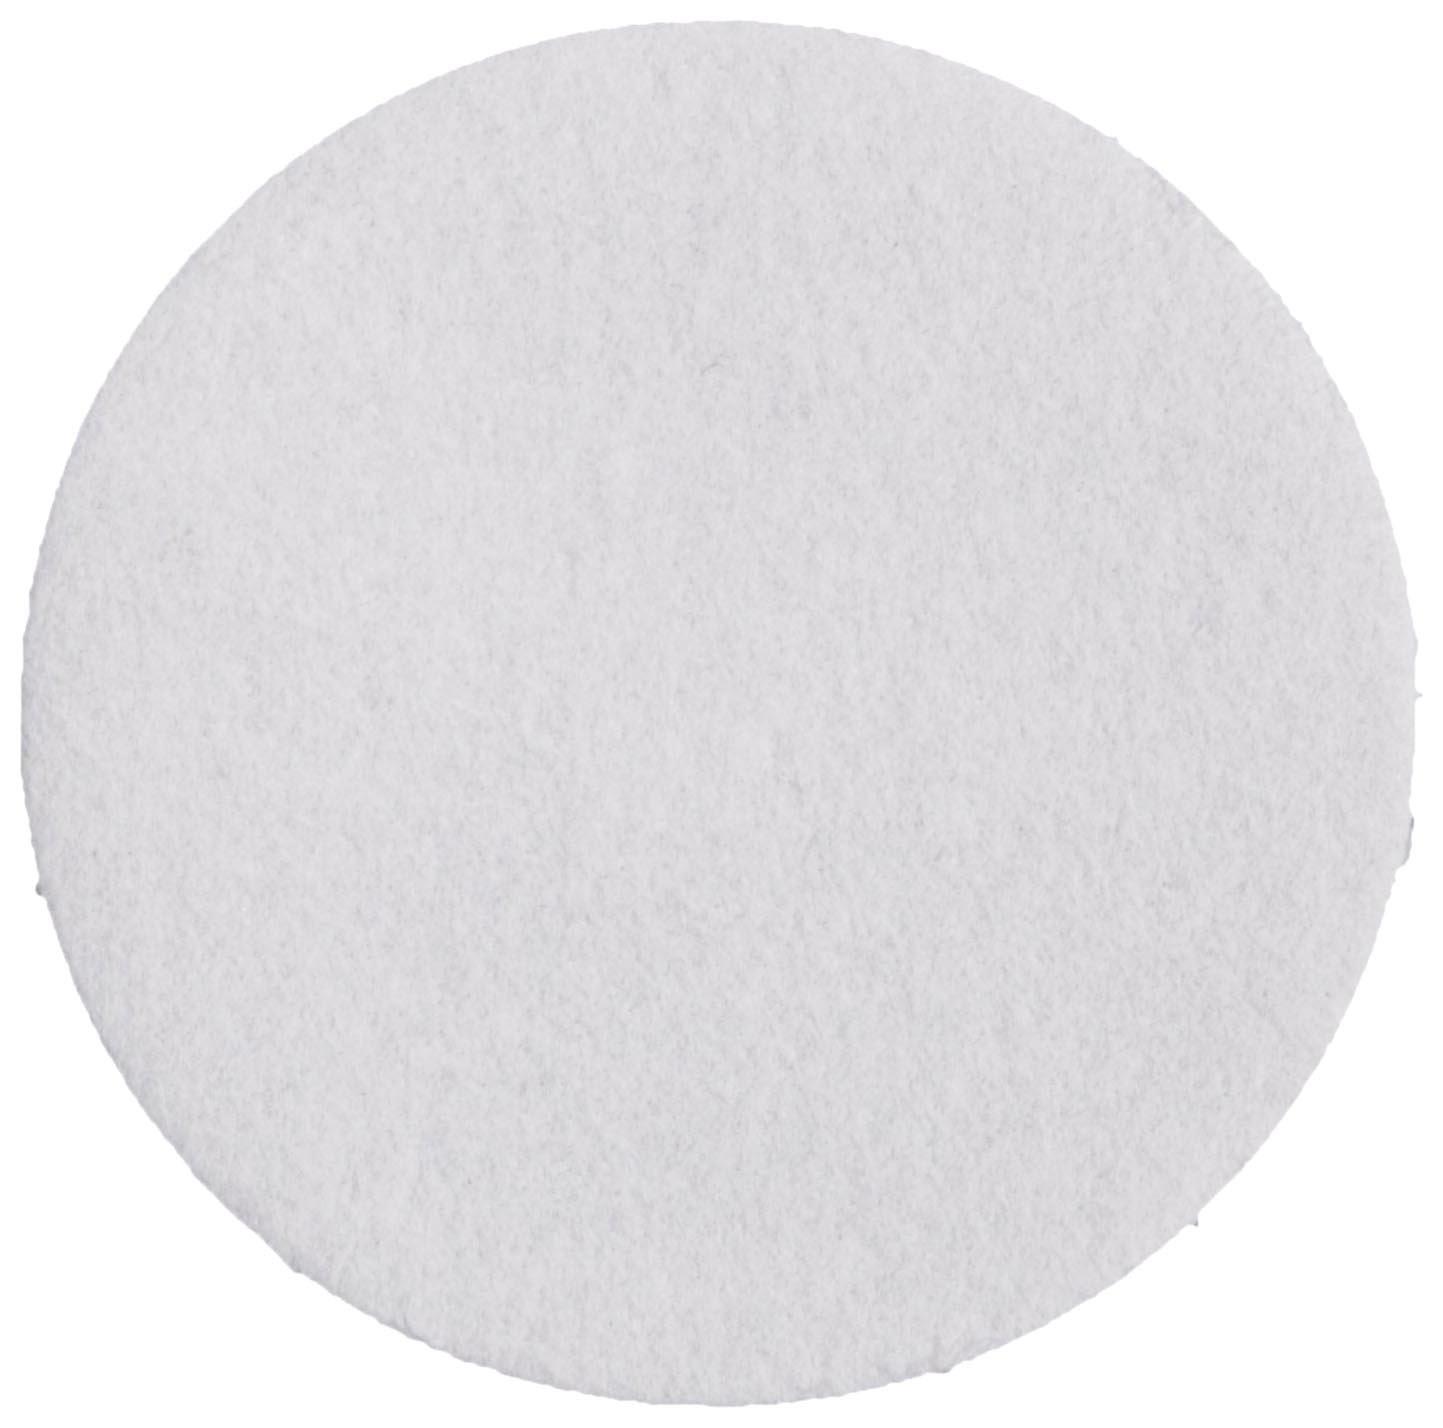 Whatman 10311810 Quantitative Filter Paper Circles, 4-7 Micron, Grade 597, 110mm Diameter (Pack of 100)